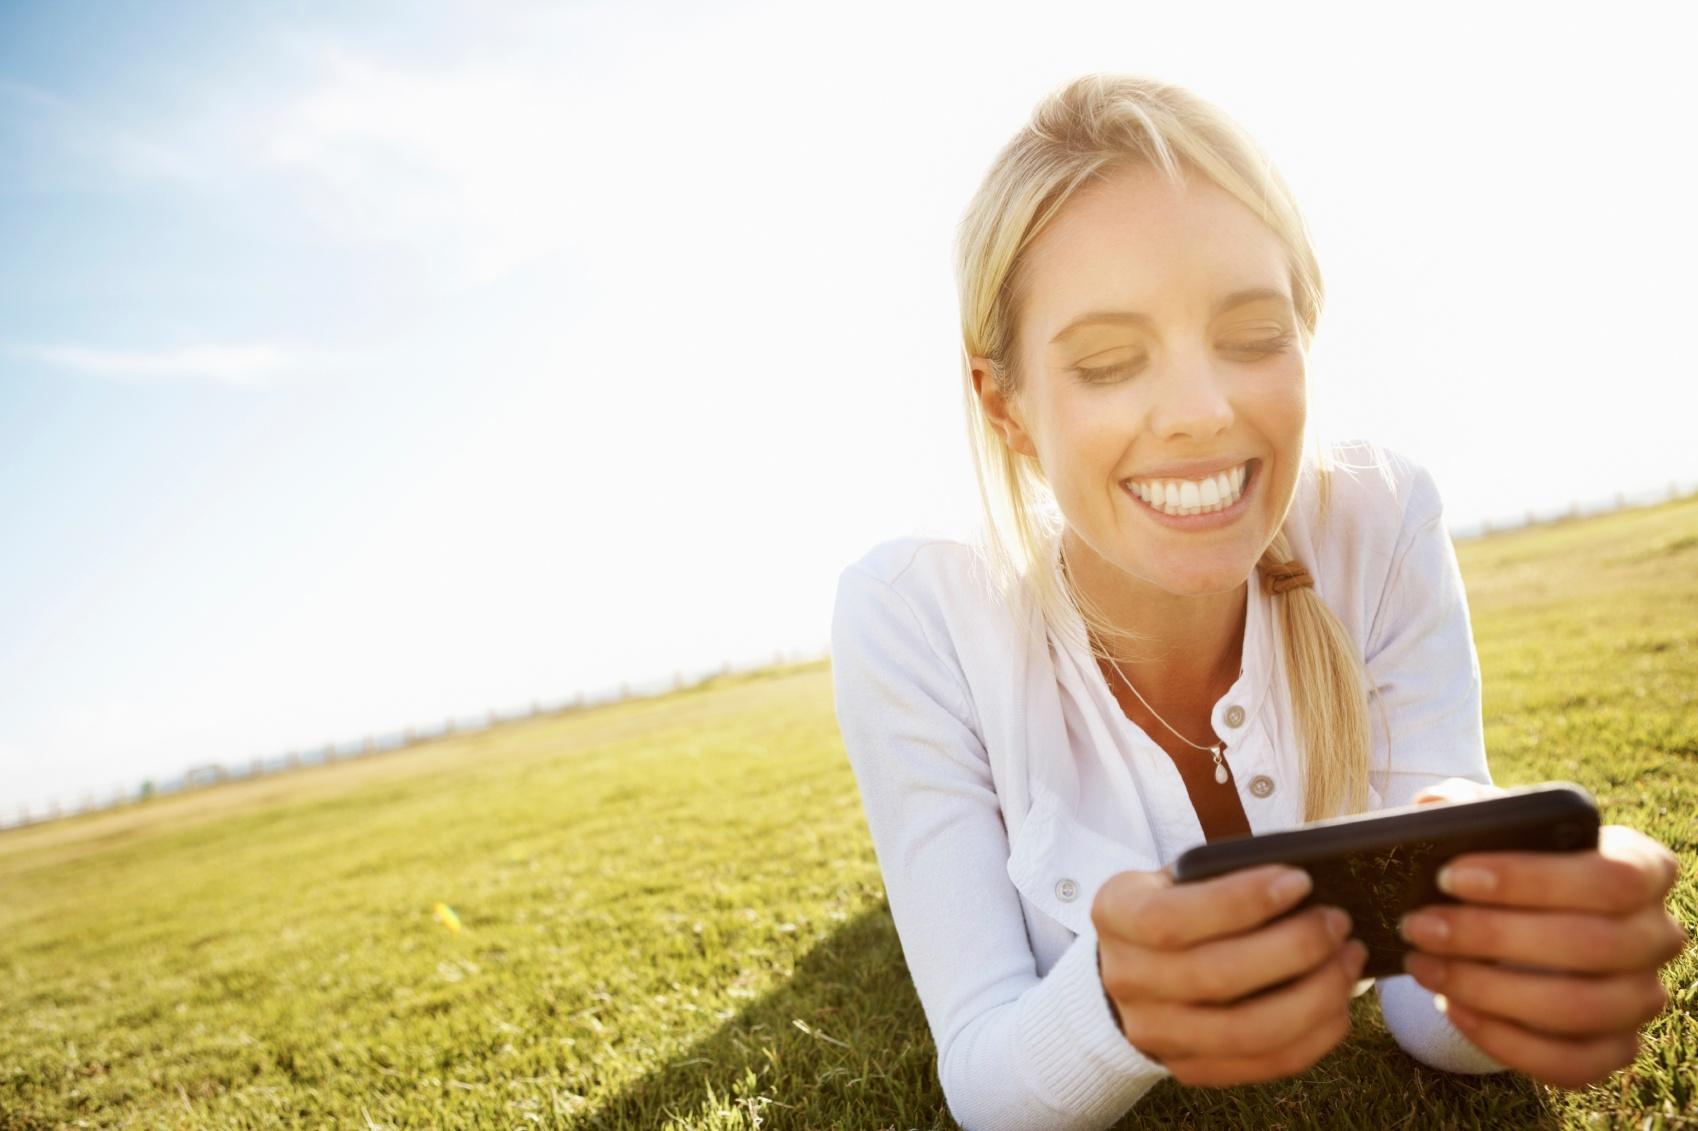 woman on grass texting.jpg